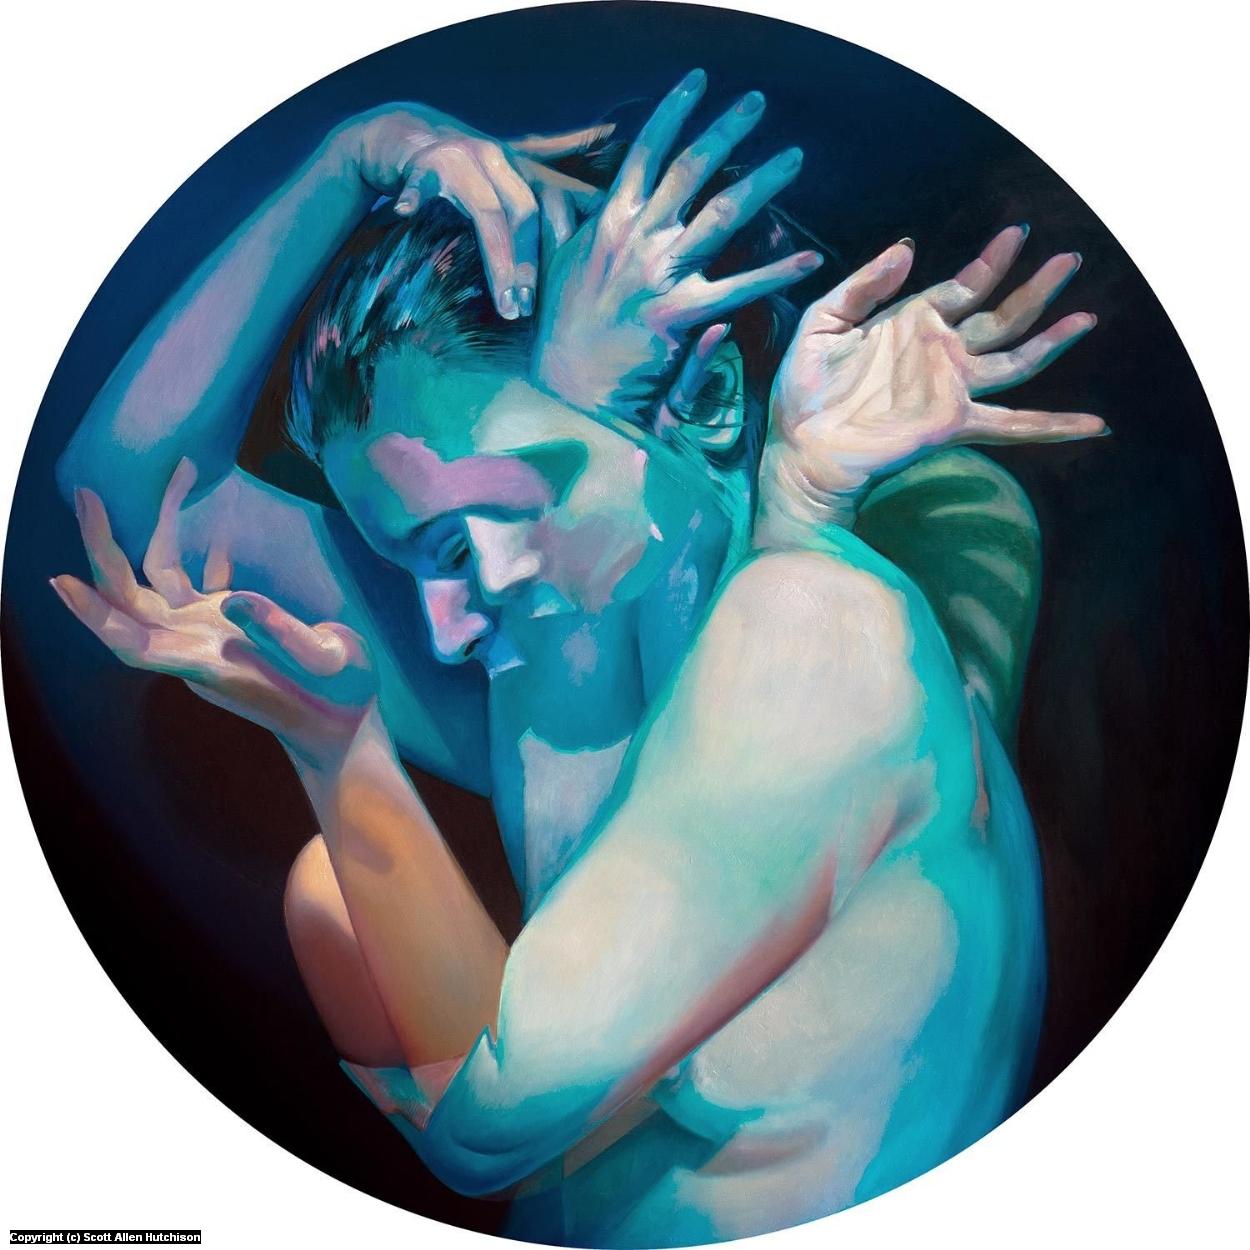 Metamorphosis Artwork by Scott Hutchison